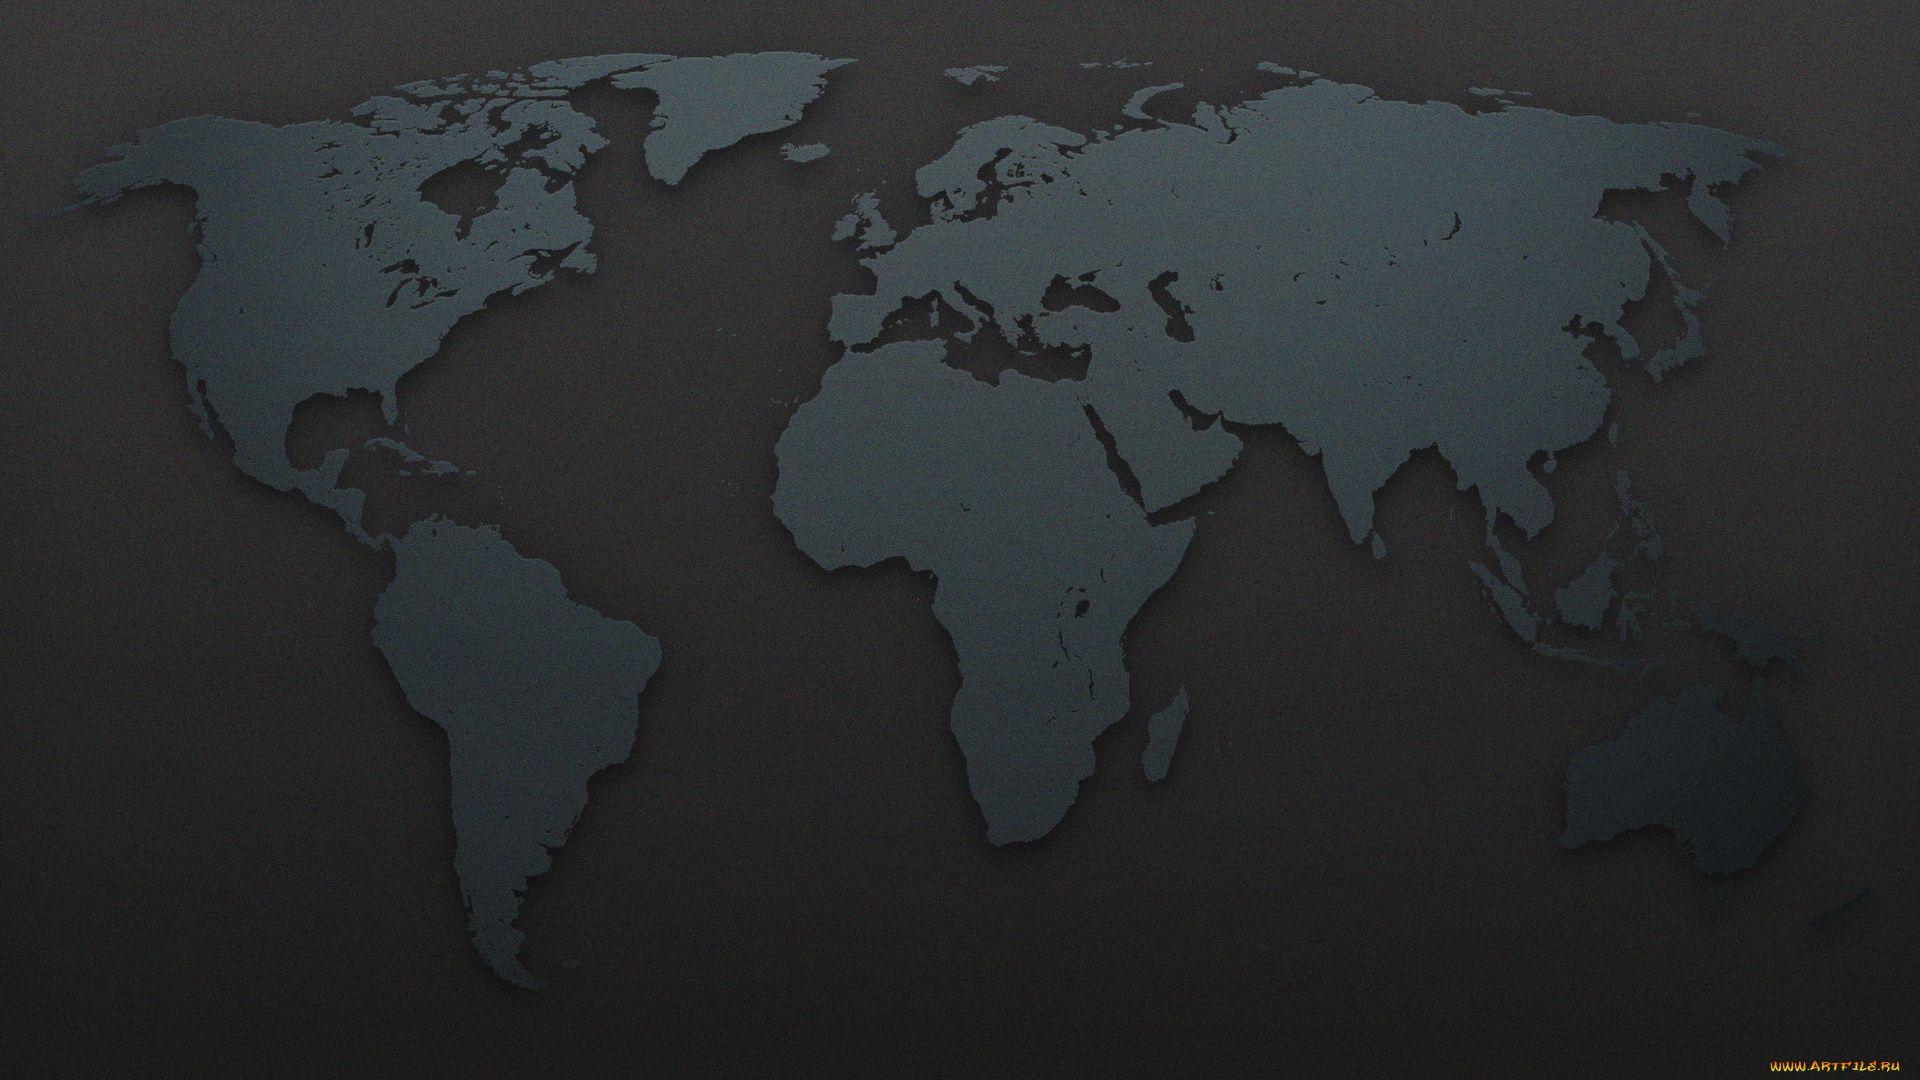 World Map background computer